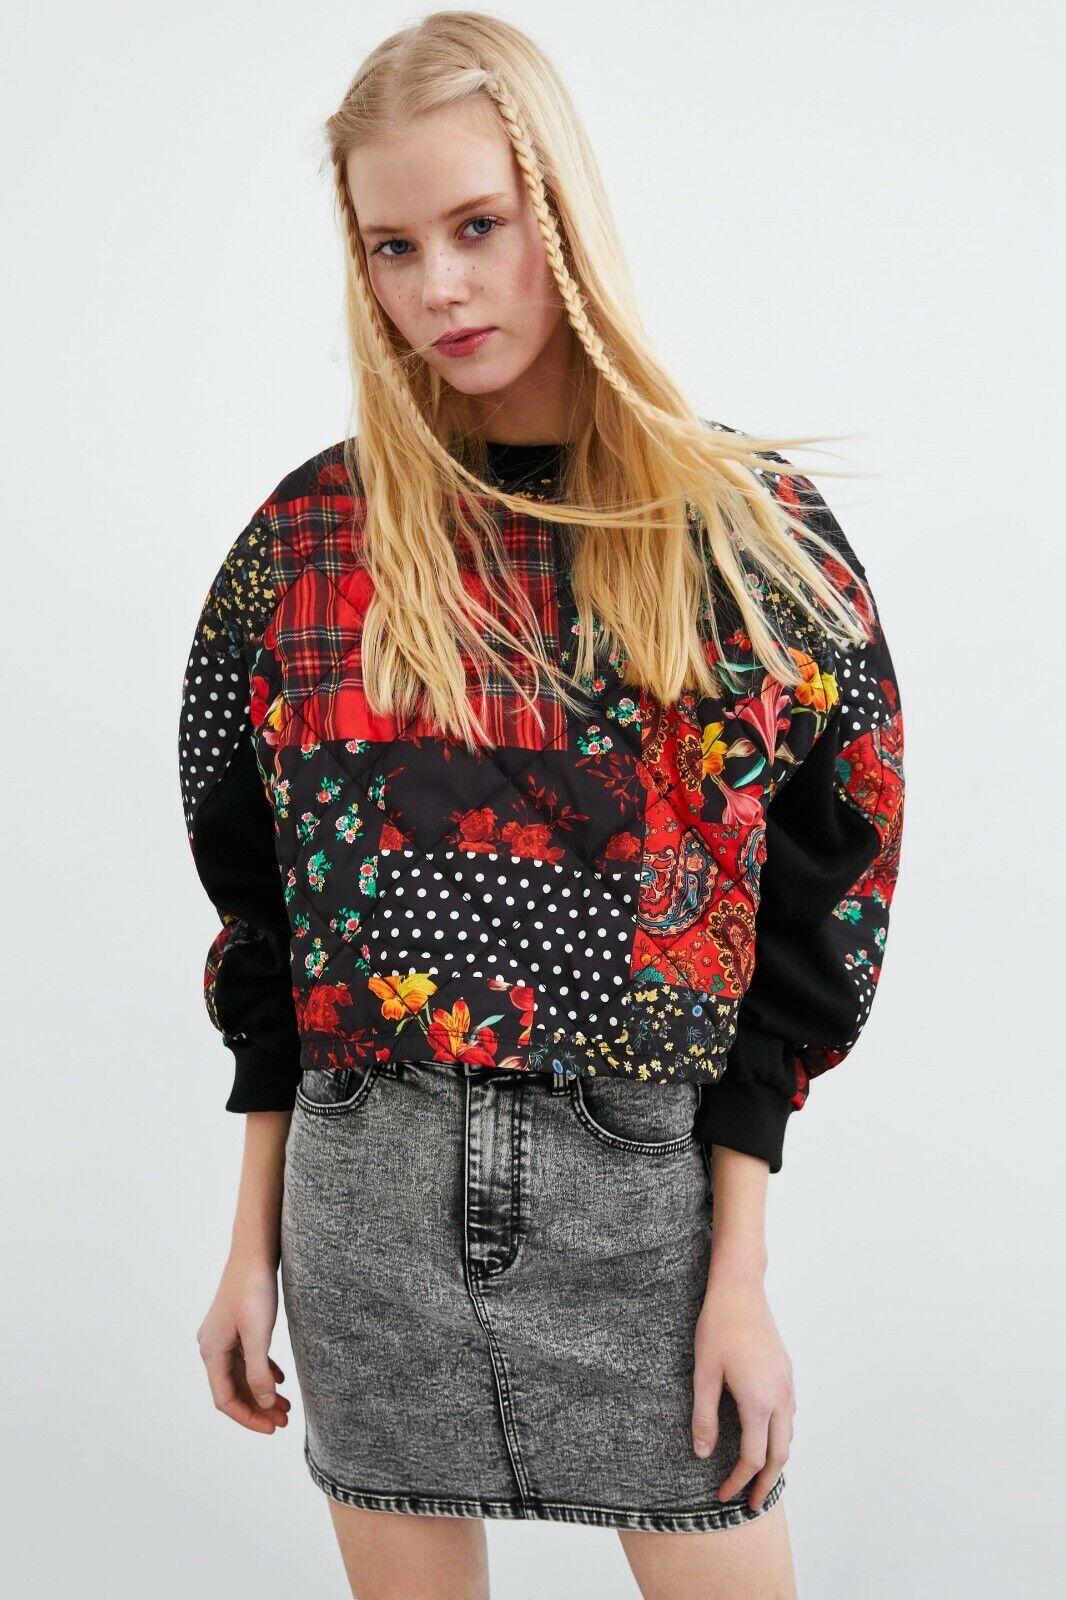 ZARA crop quilted patch work print sweatshirt floral paisley plaid polka  S NEW